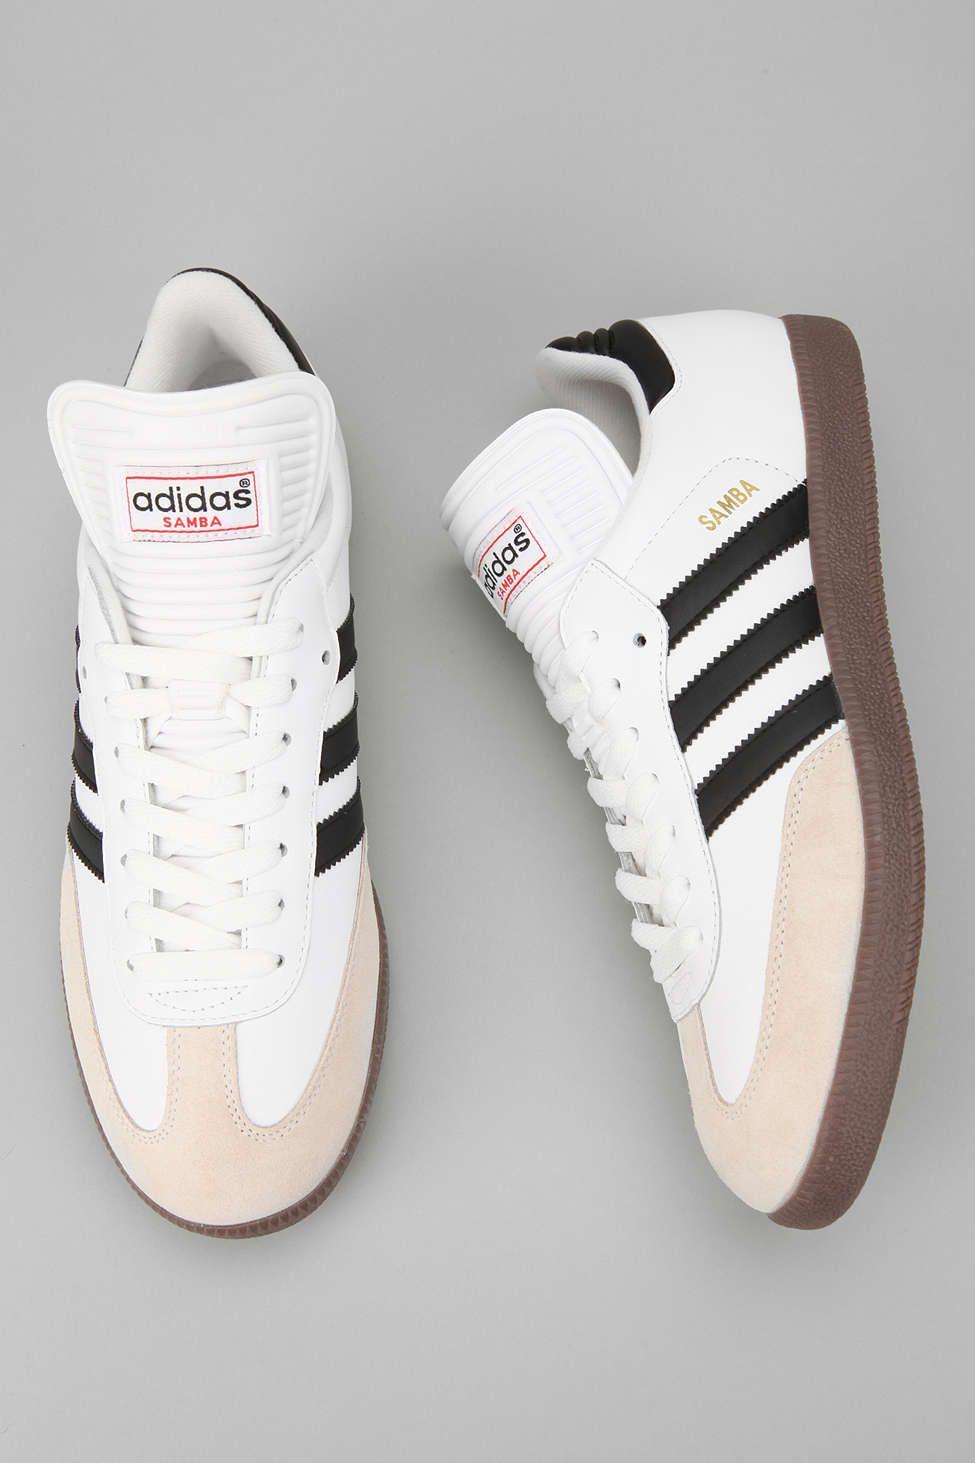 Adidas Samba Classico Scarpe Originali Urban Classico Scarpe da Ginnastica, Urban Originali 2c4a6a